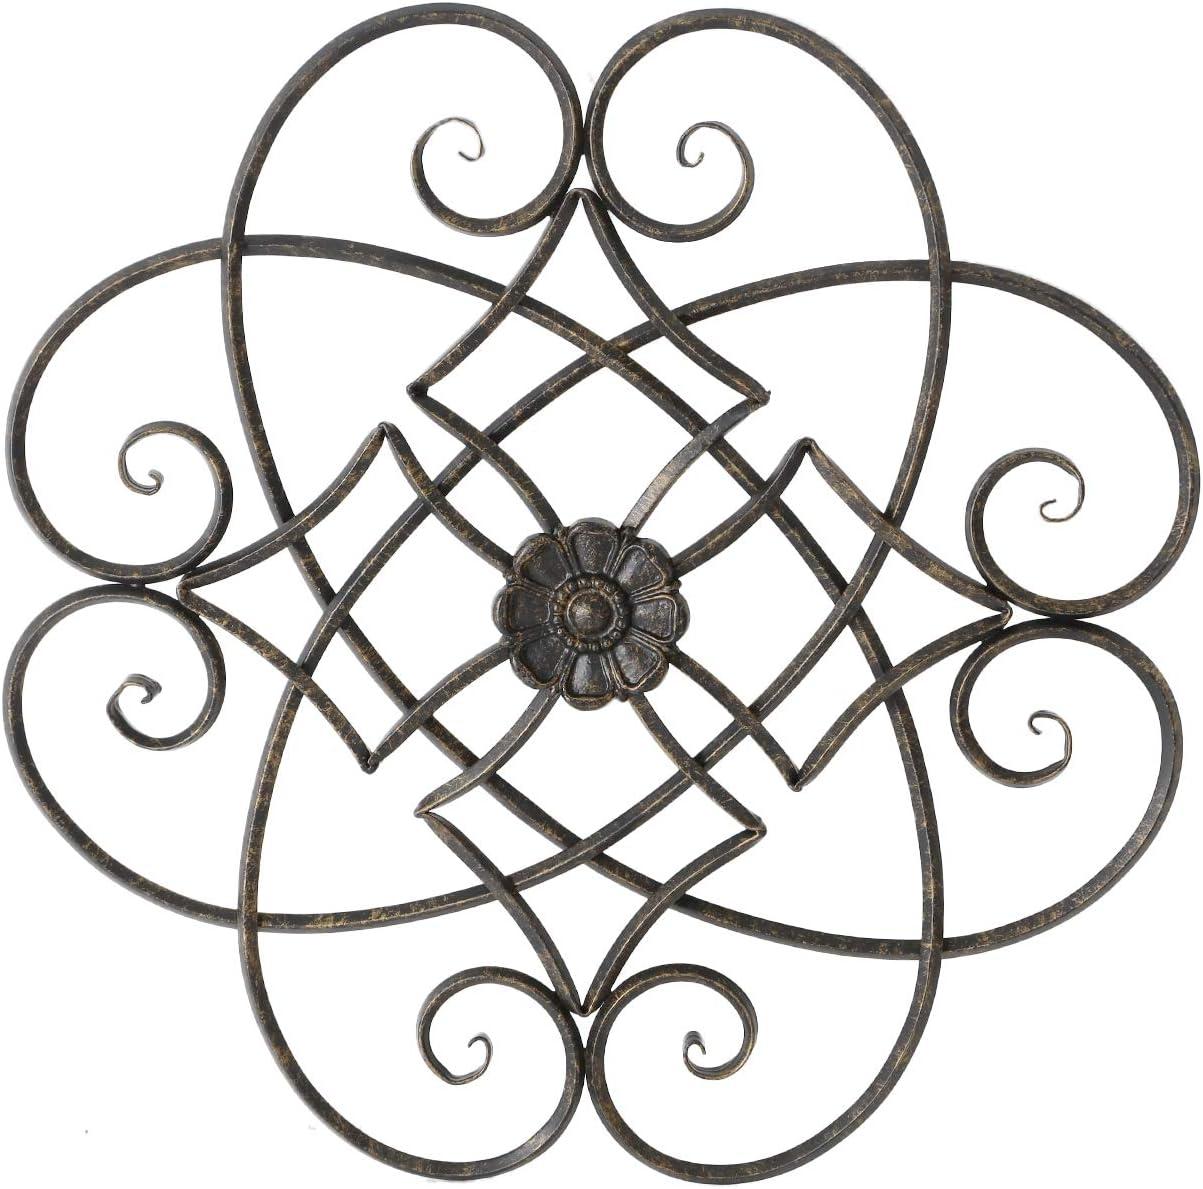 Adeco Metal Flower Wall Decor, Decorative Black Scrolled Flower